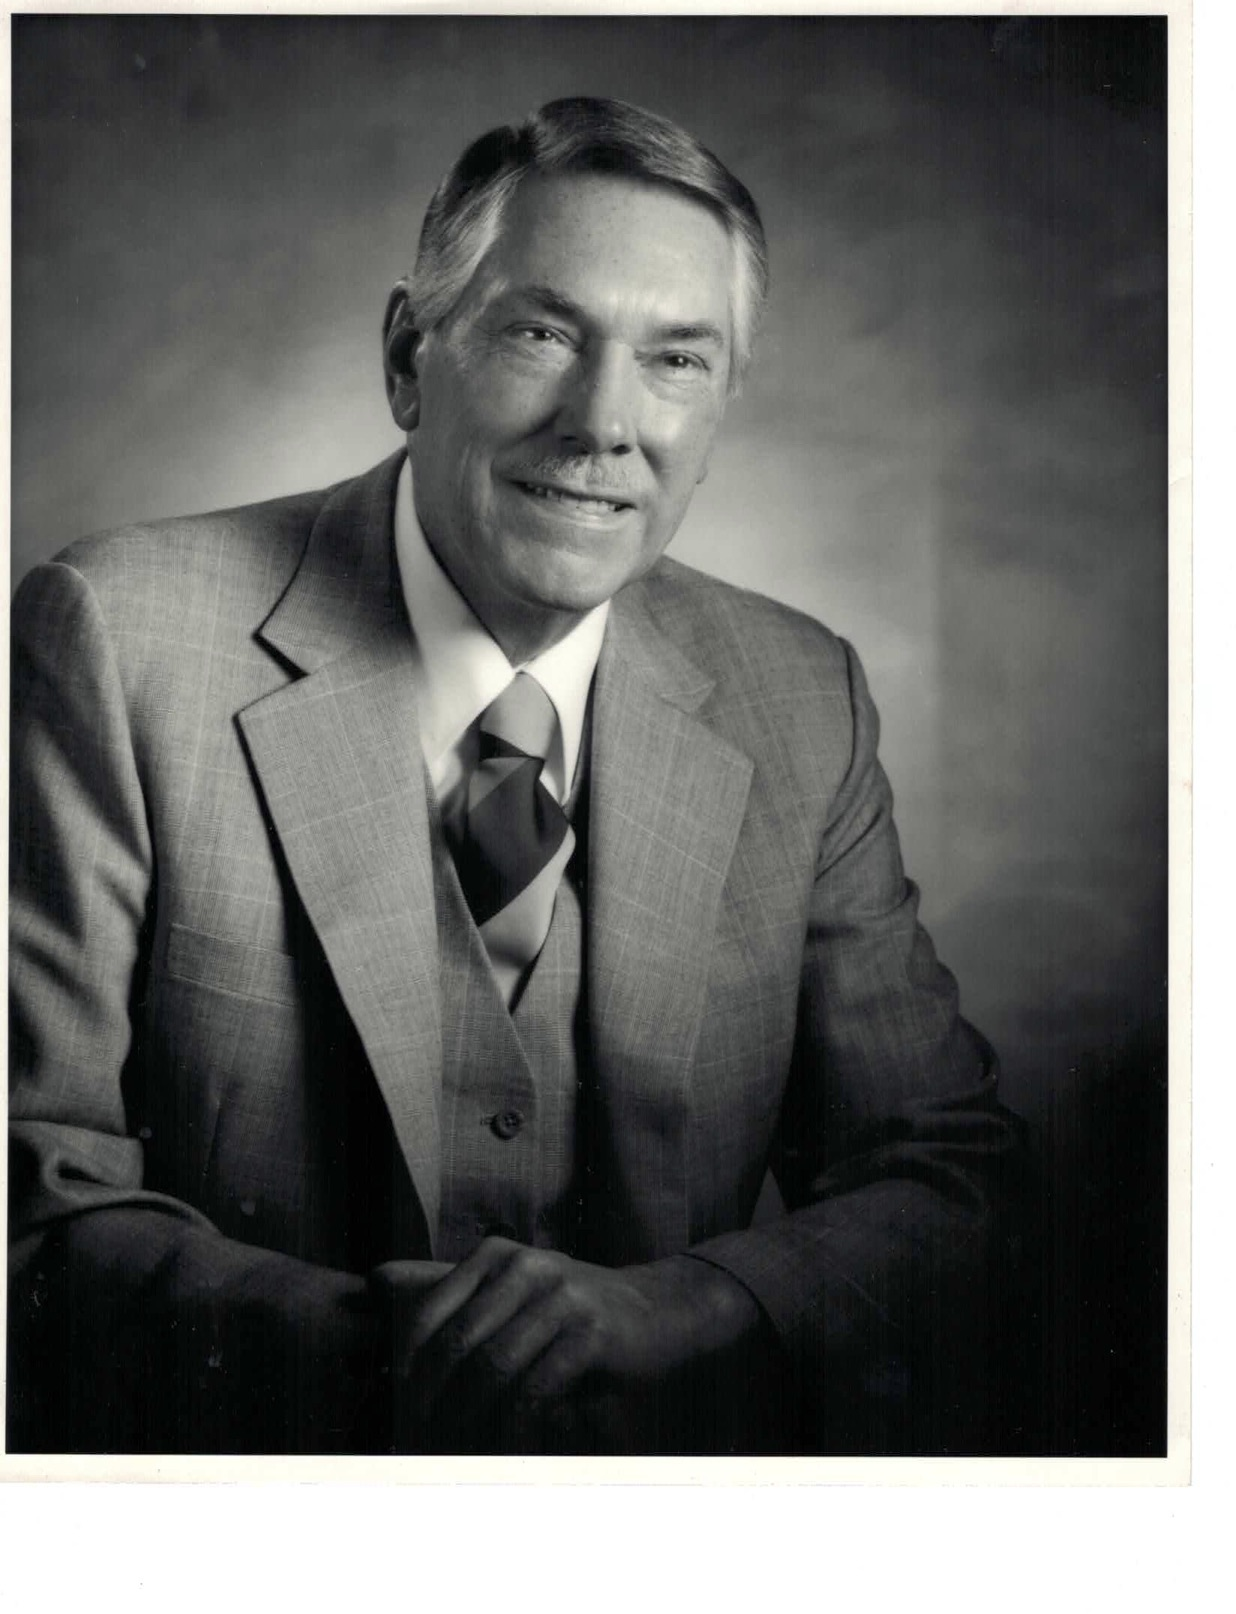 GEORGE C. WHITTLE 1980-81